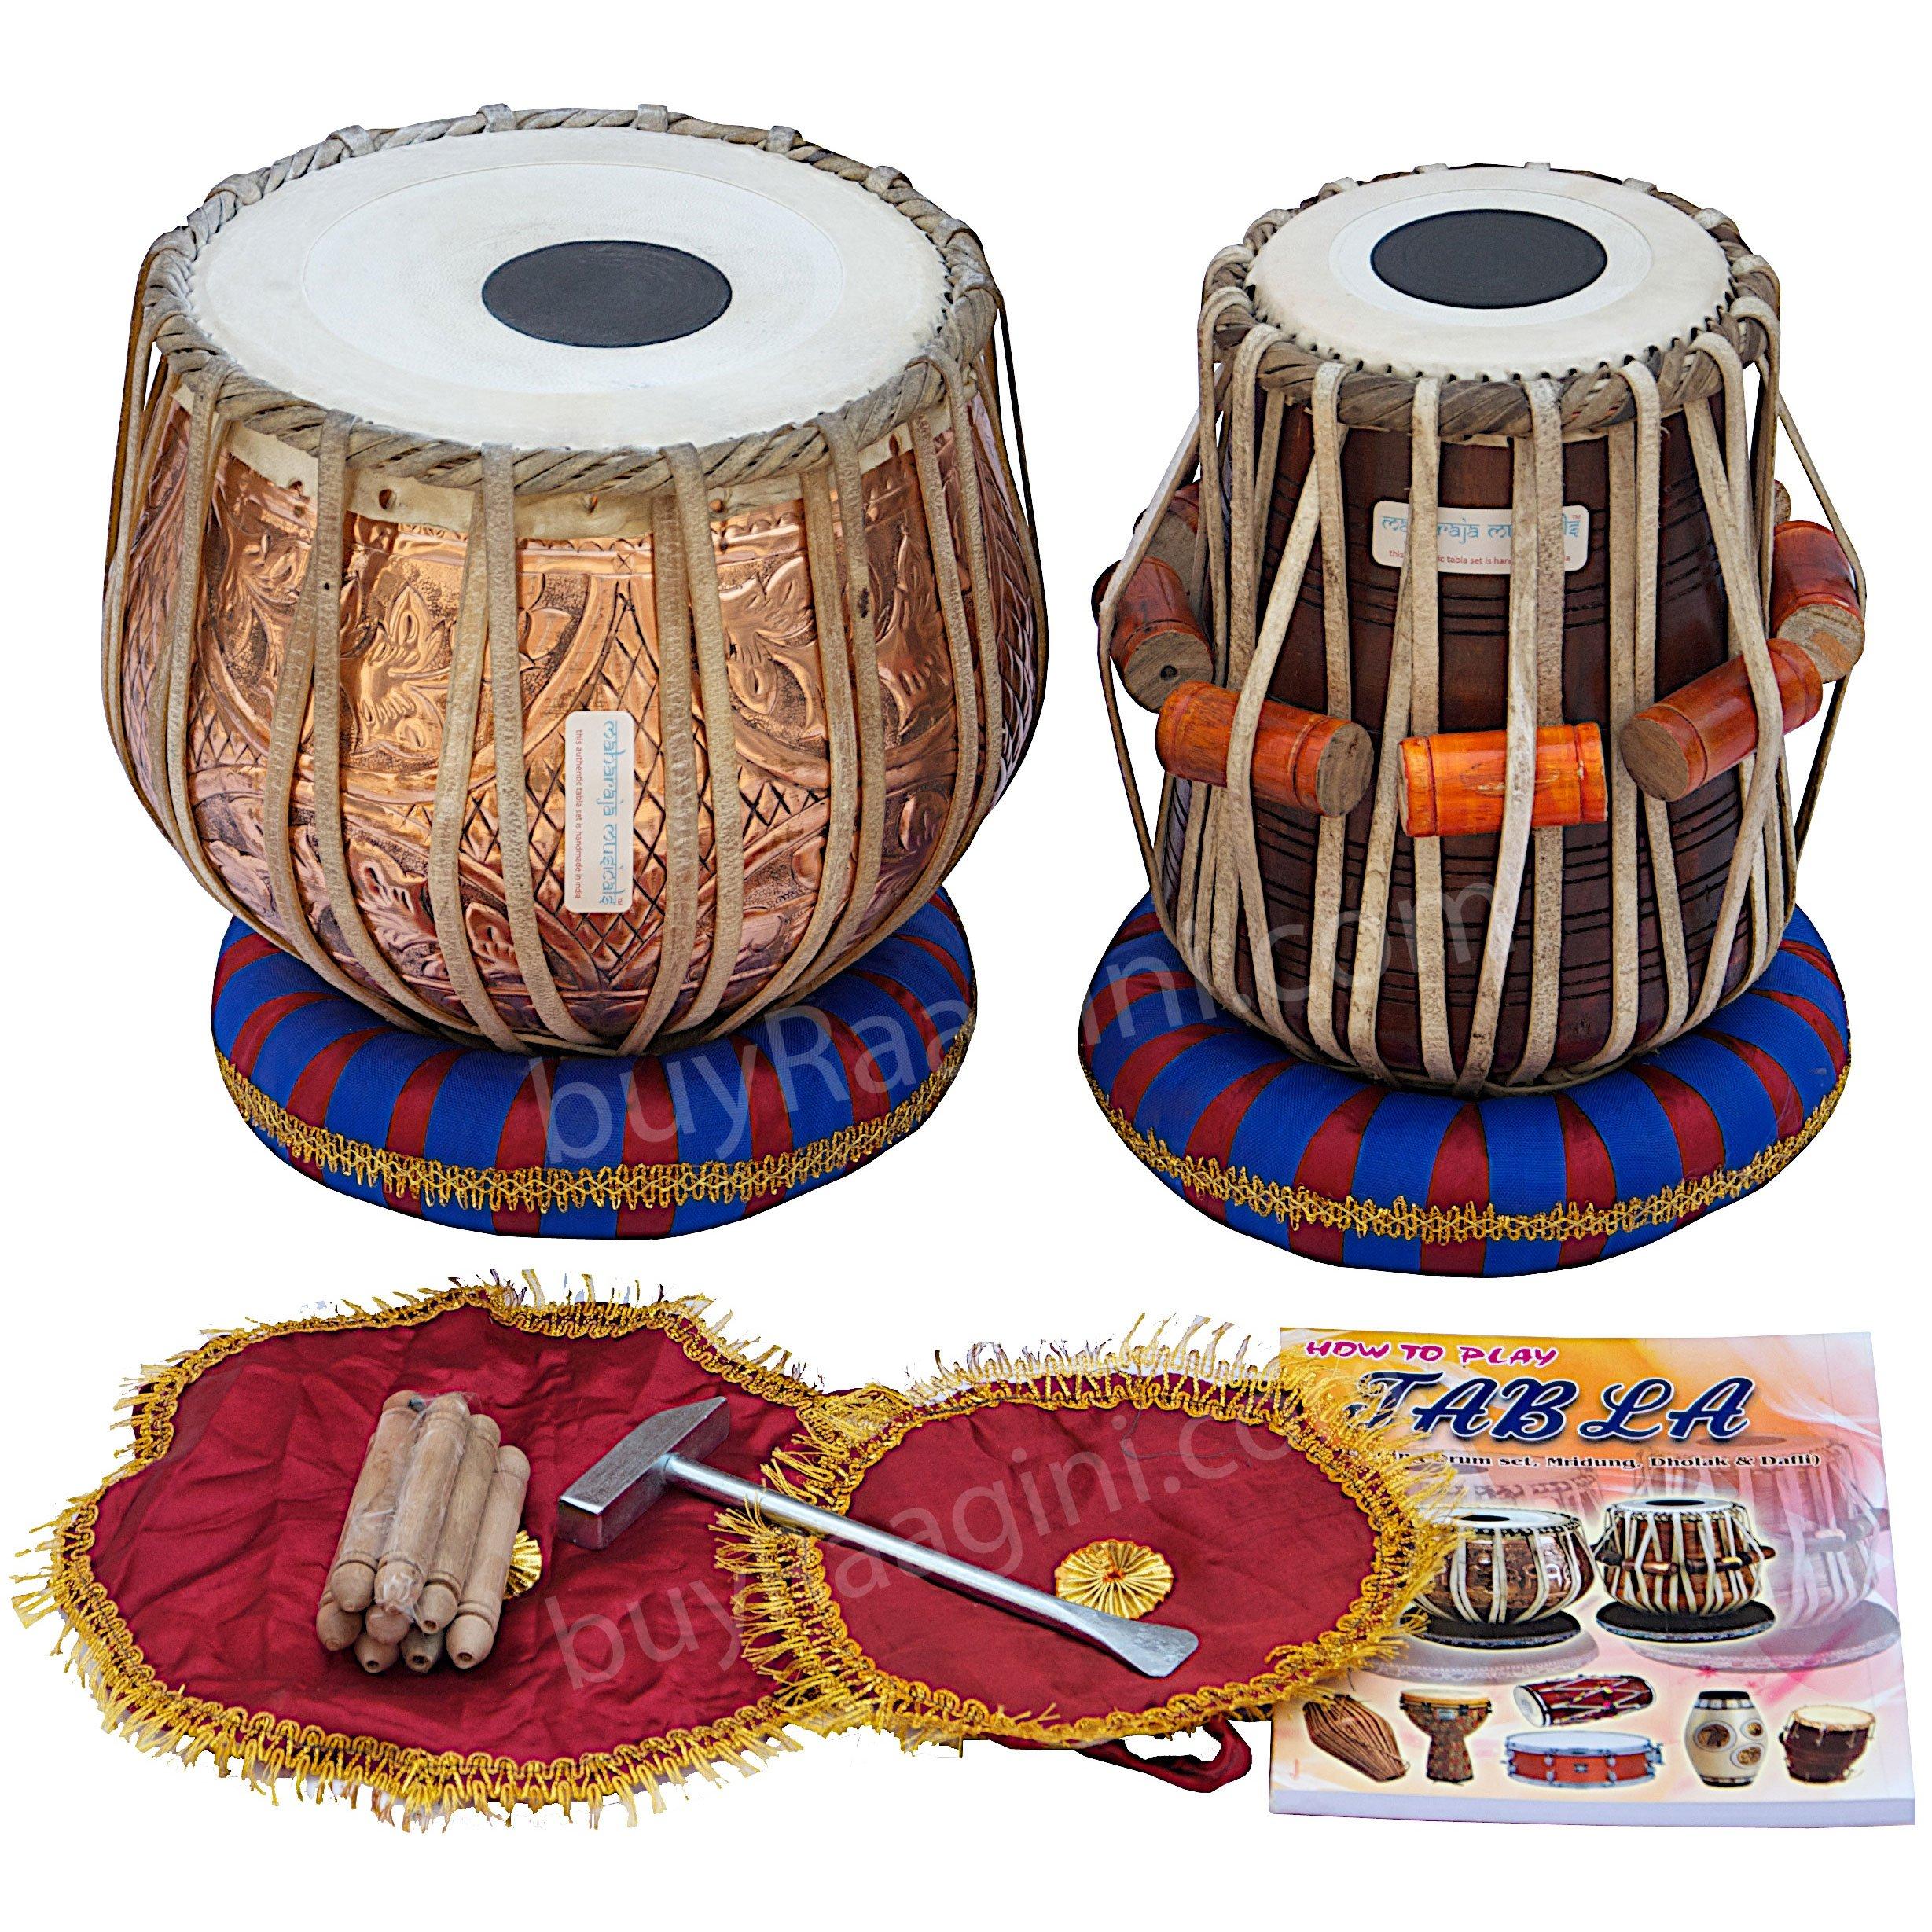 Tabla Drum Set, Maharaja Musicals, Professional, 3Kg Designer Copper Bayan, Sheesham Tabla Dayan, Padded Bag, Hammer, Cushions, Cover, Tuned Tabla Set (PDI-EB)